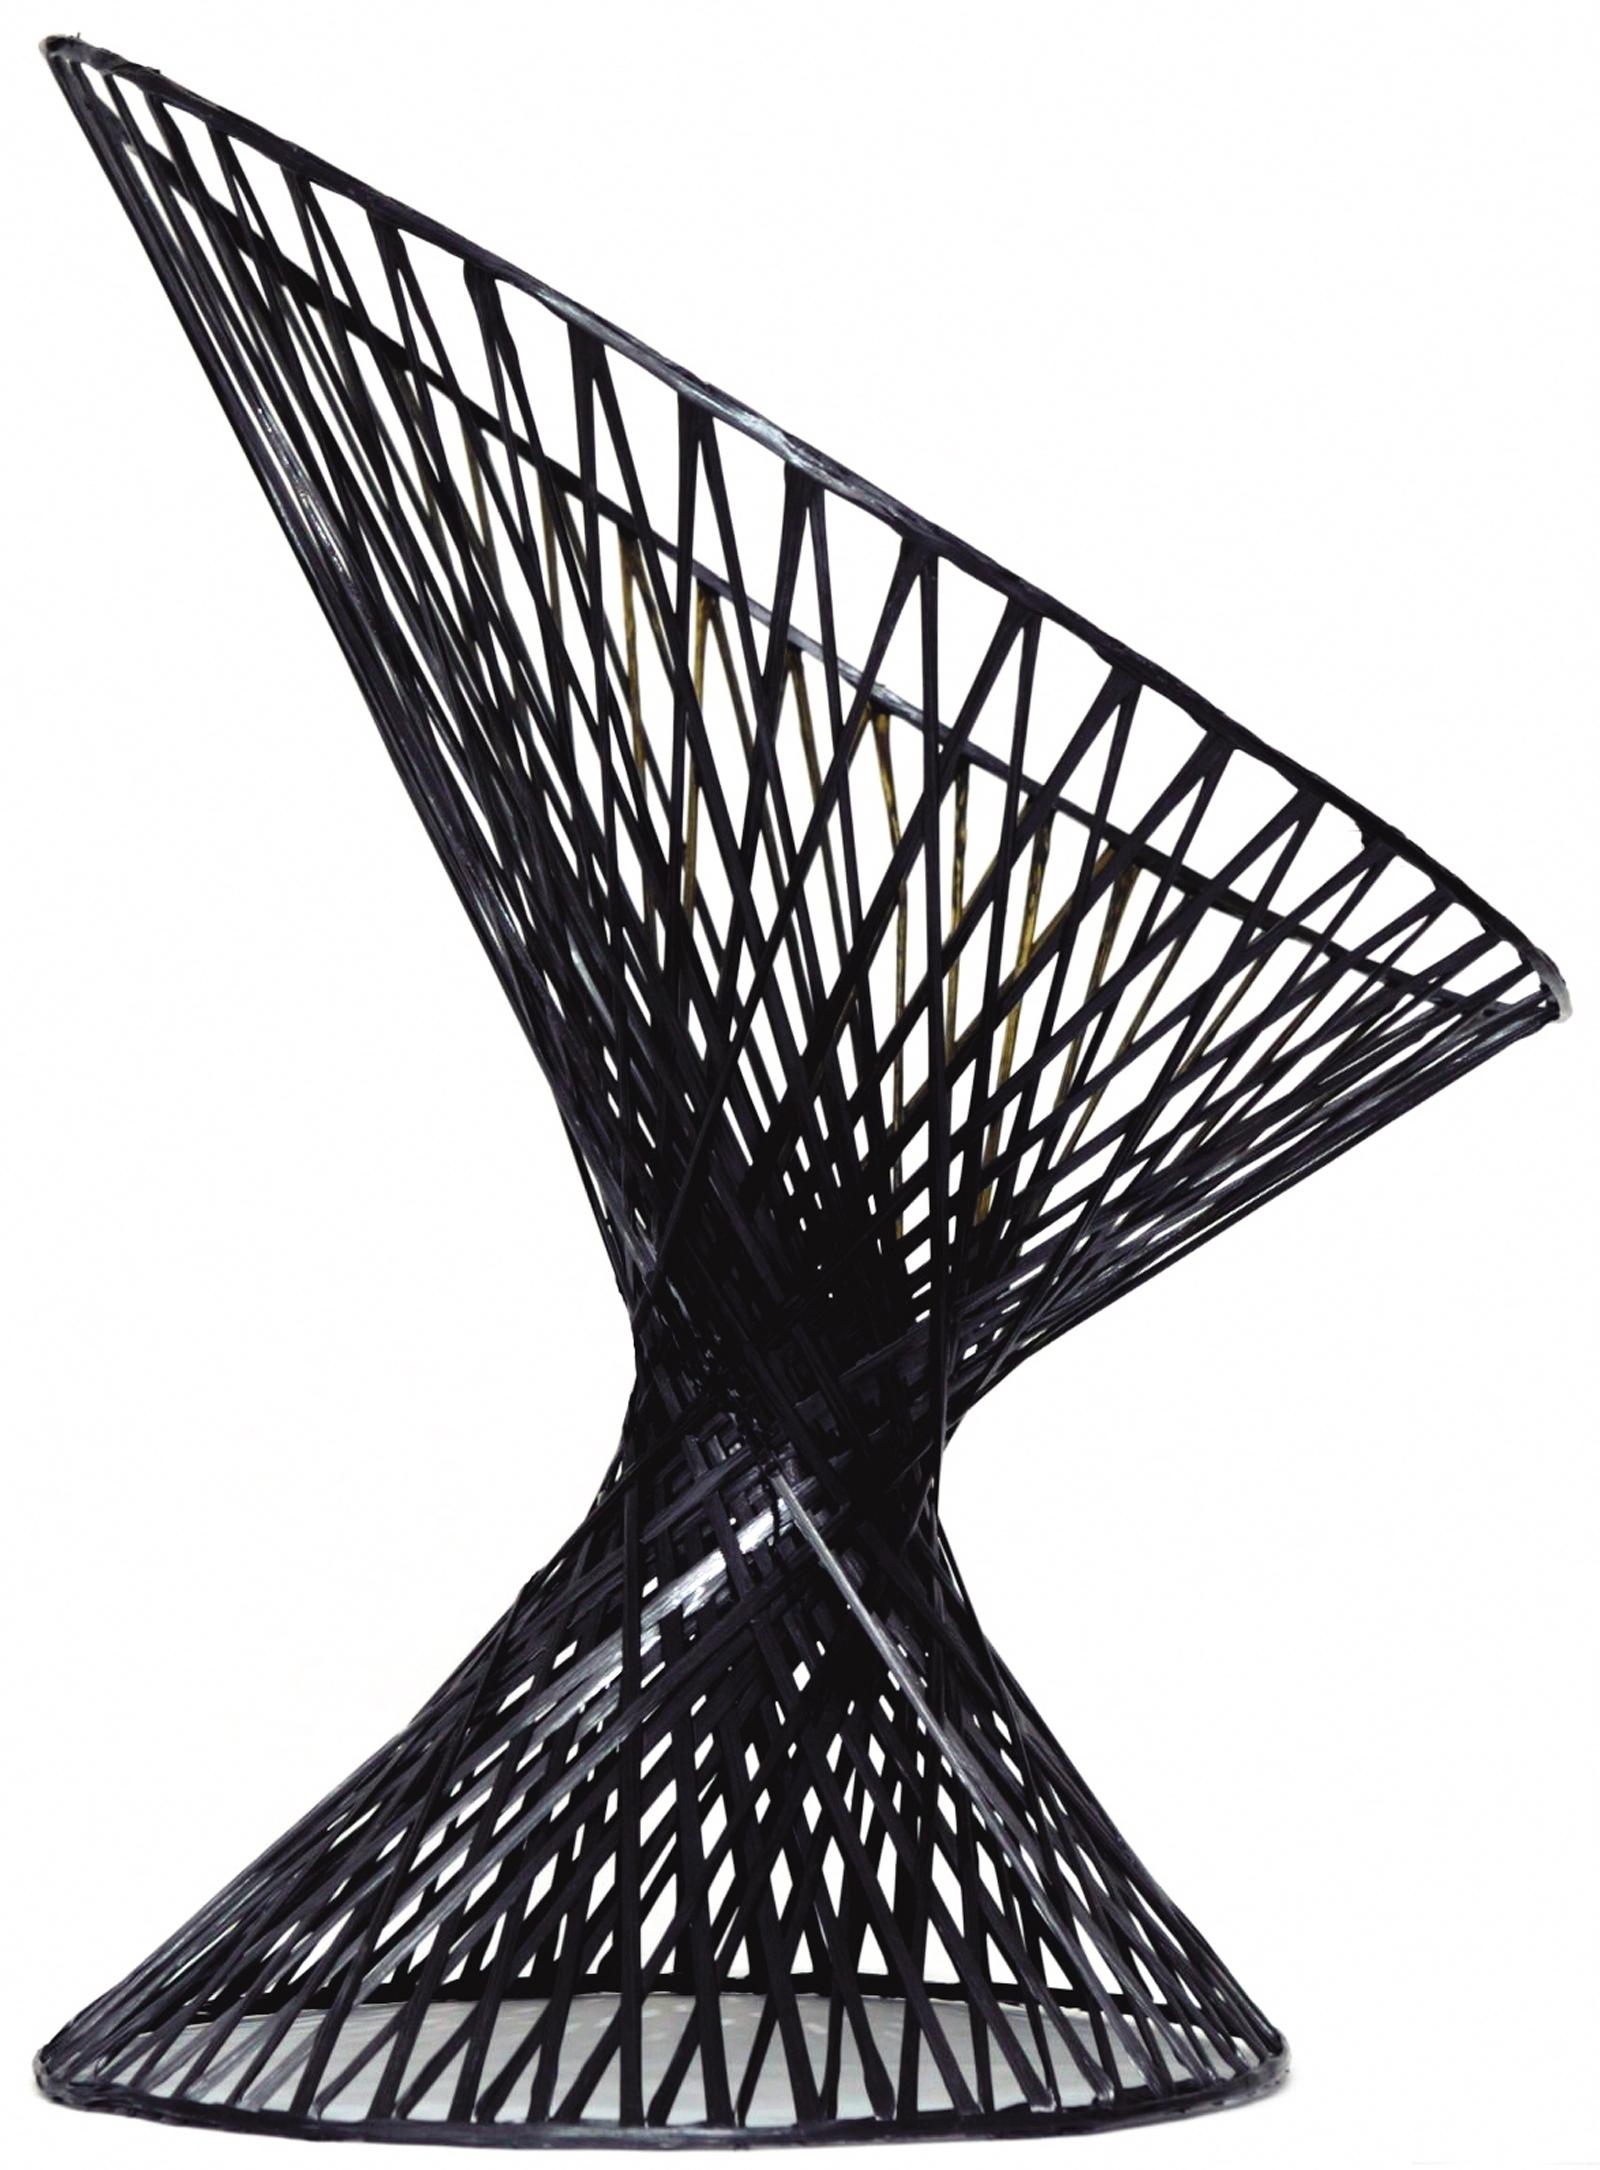 Carbon-fiber 'Spun Chair' by Mathias Bengtsson of Denmark, 2002. Photo by Jeppe Gudmundsen Holmgreen.